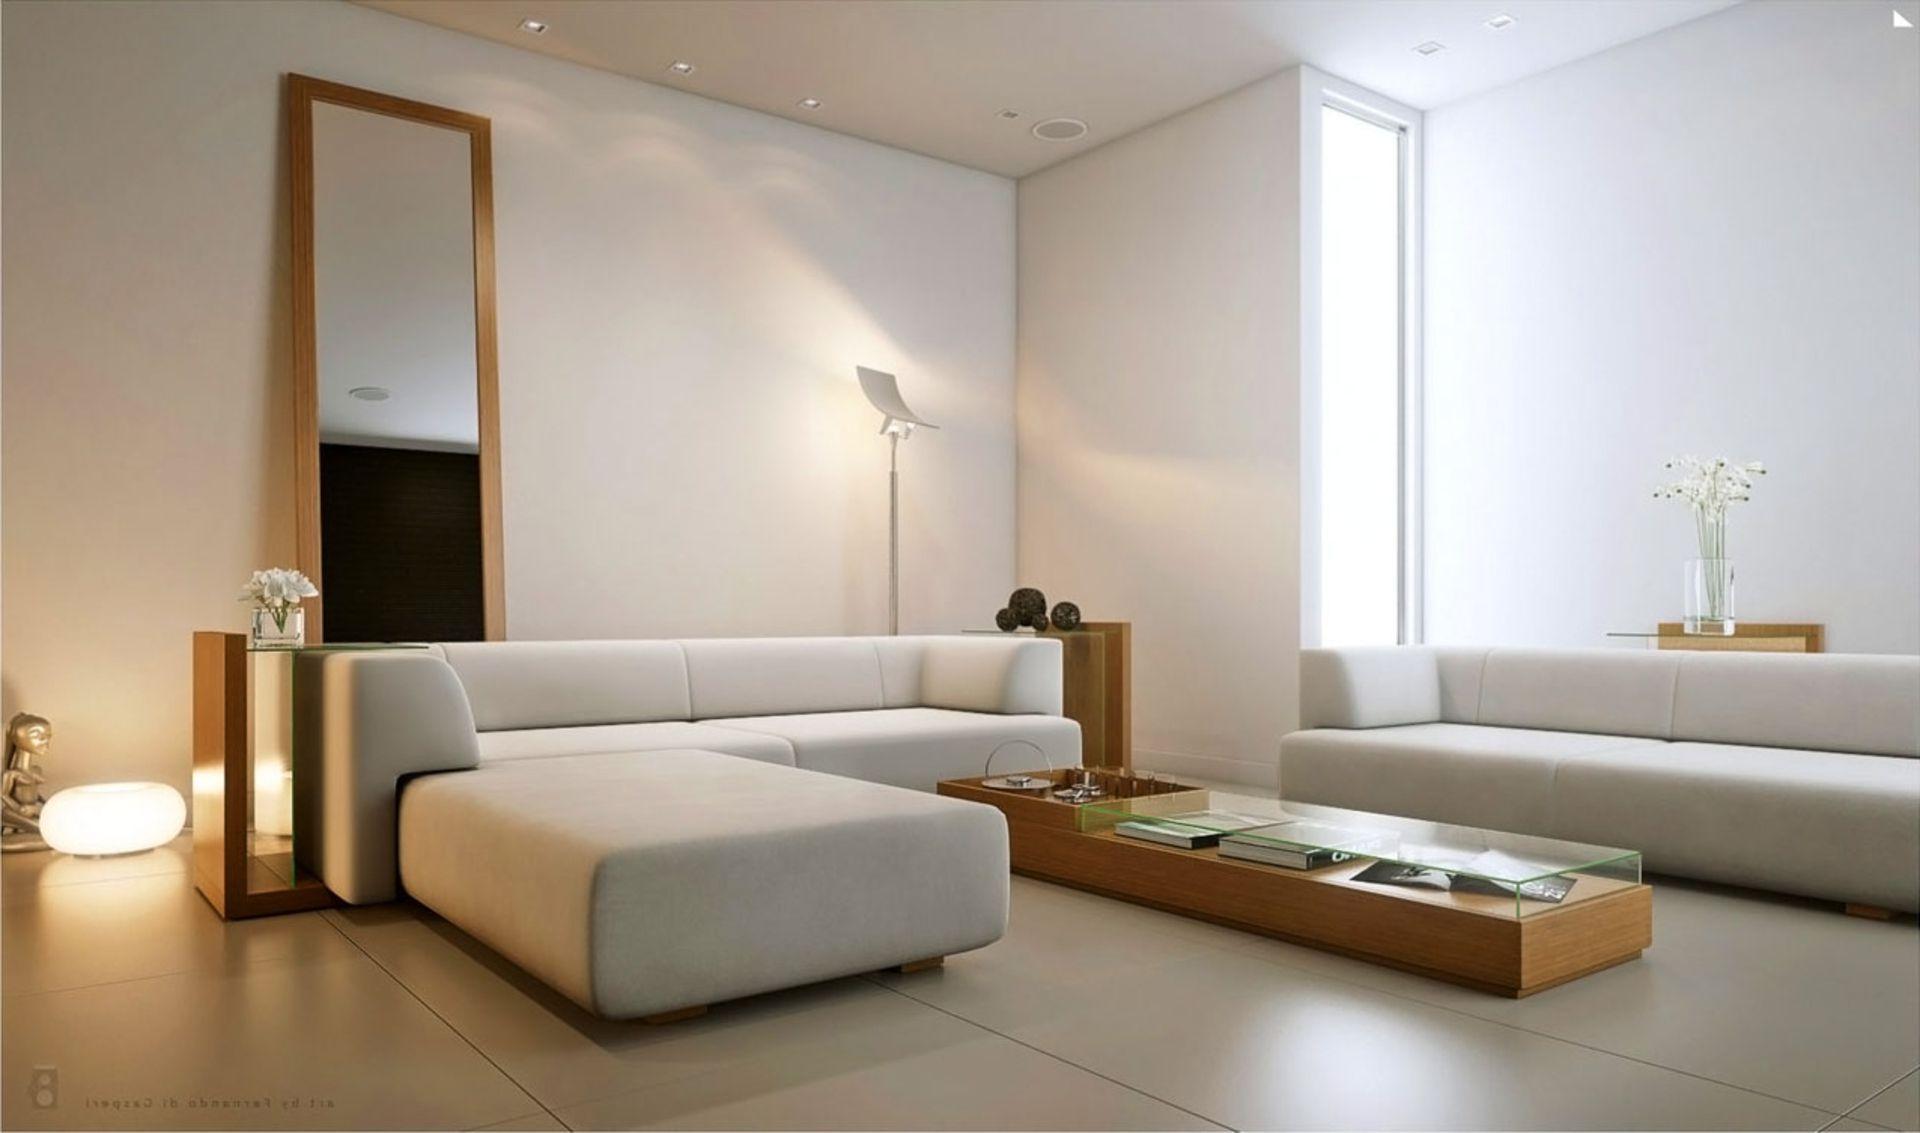 Stunning Kwaliteitscontrast Interieur Photos - Trend Ideas 2018 ...